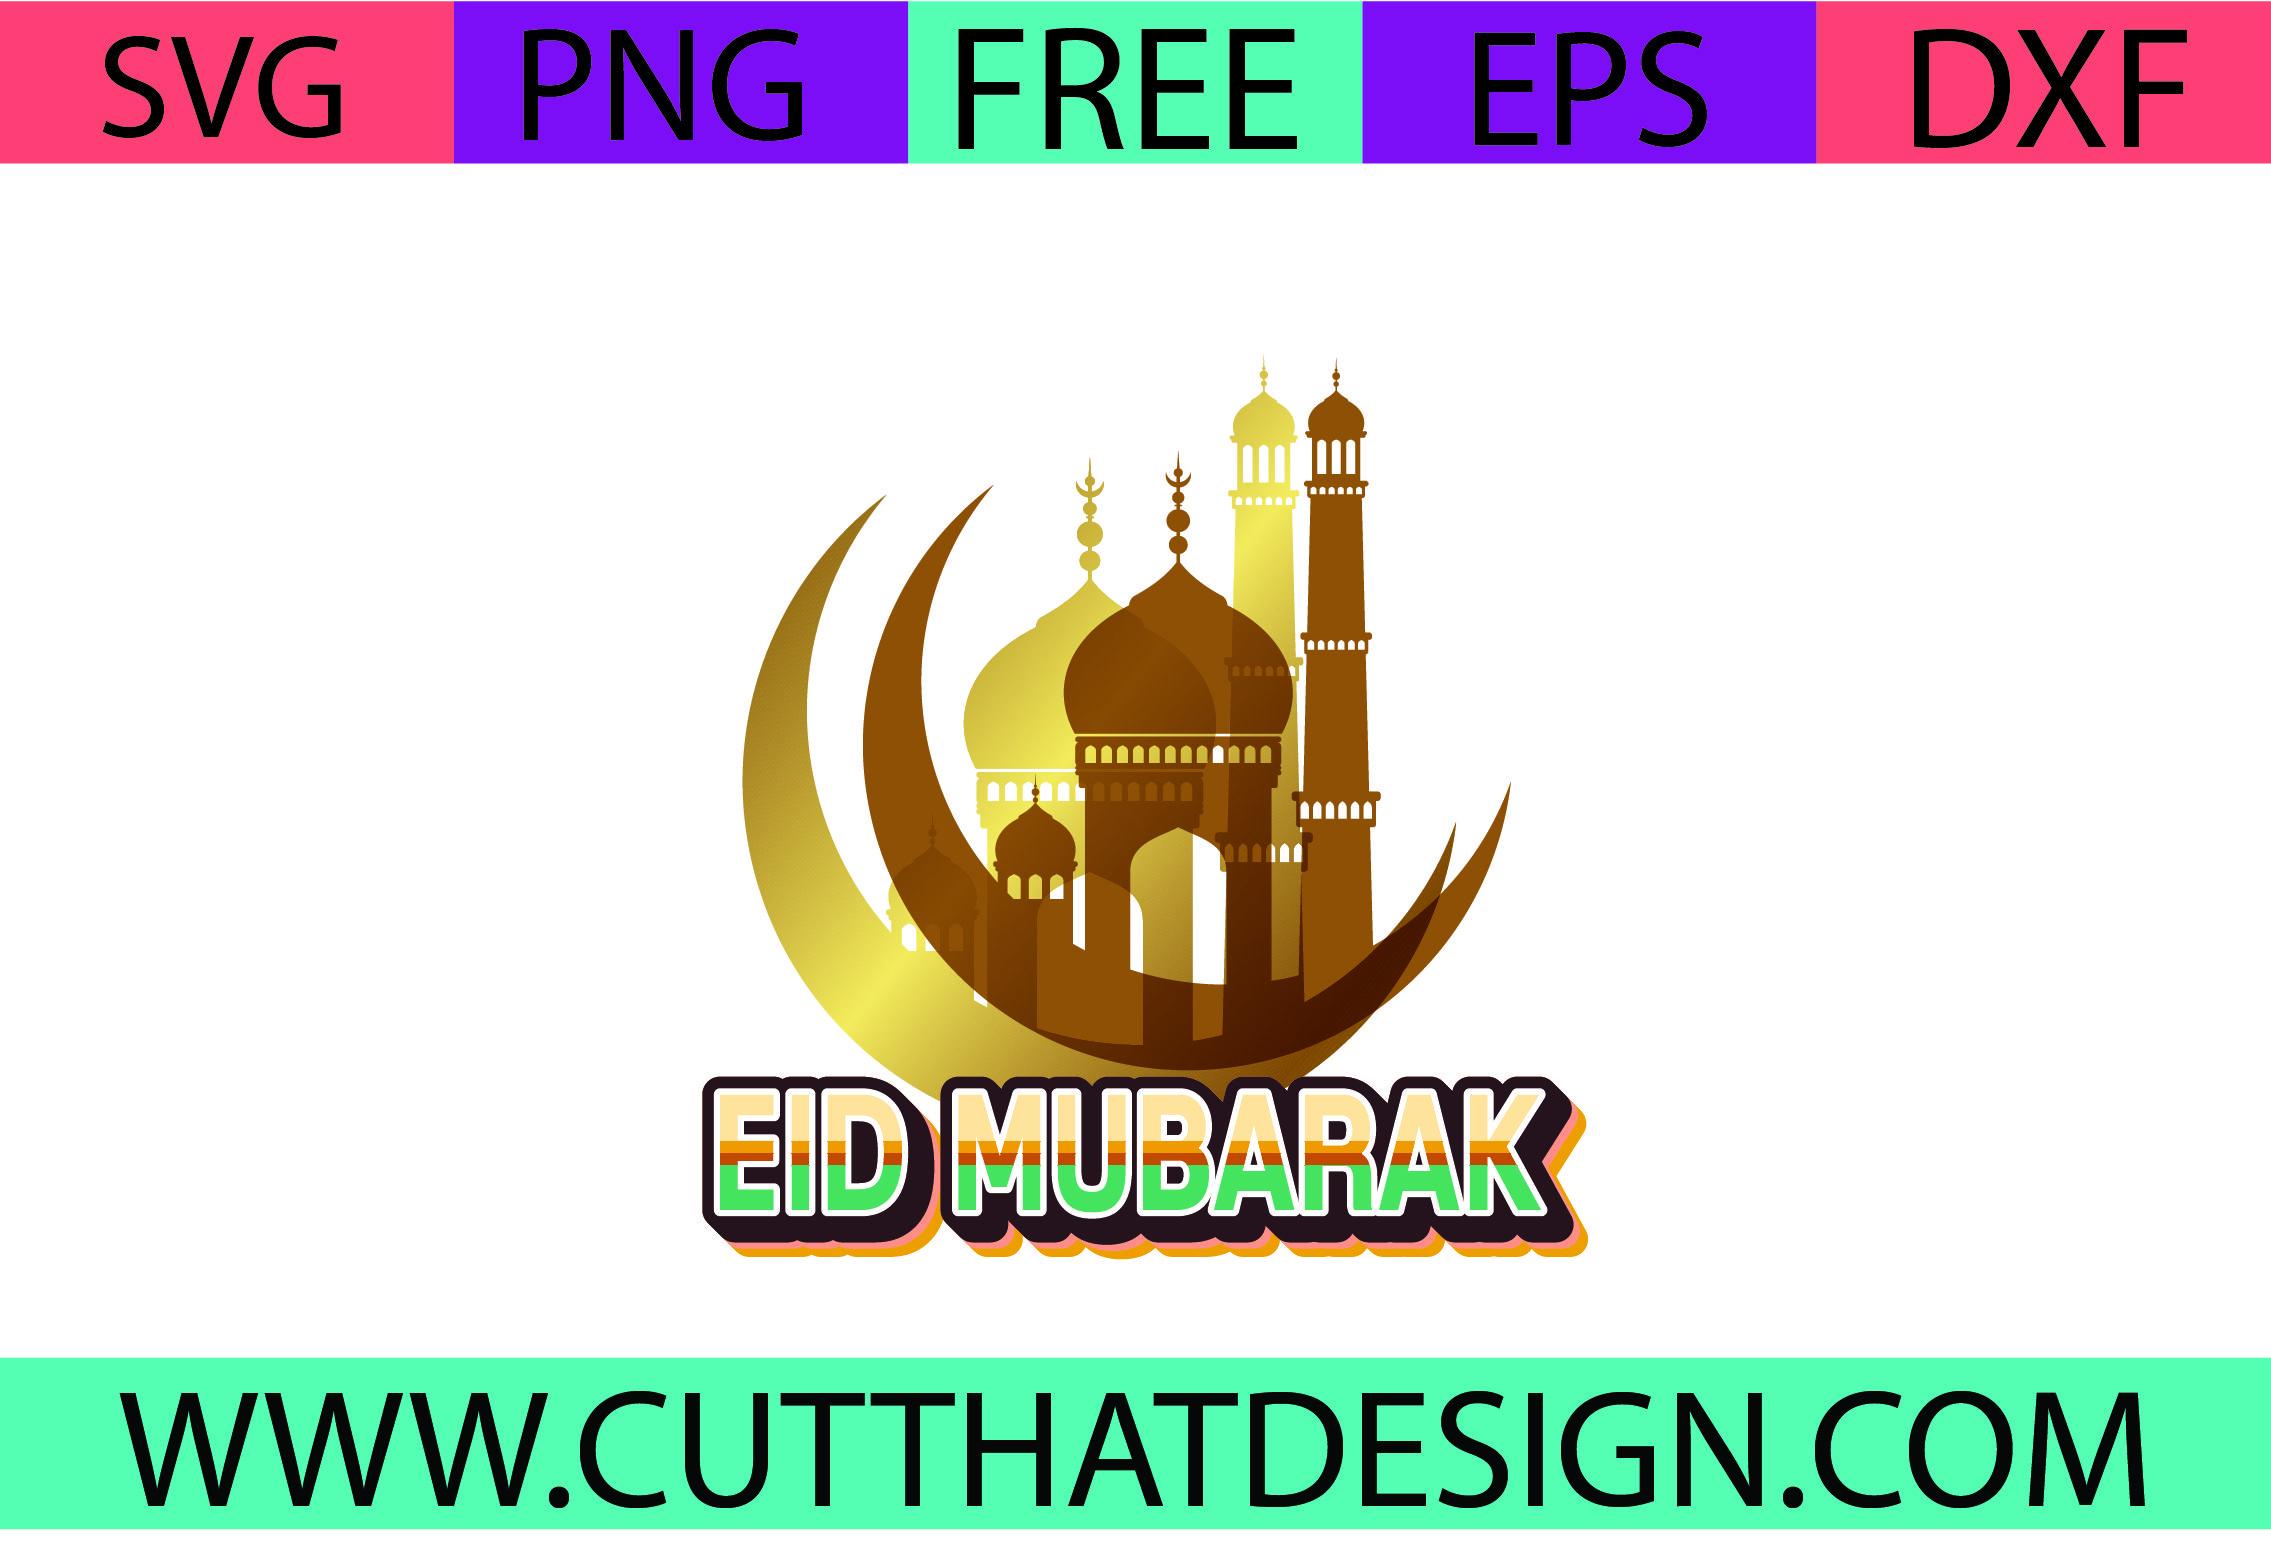 Free Eid Mubarak SVG